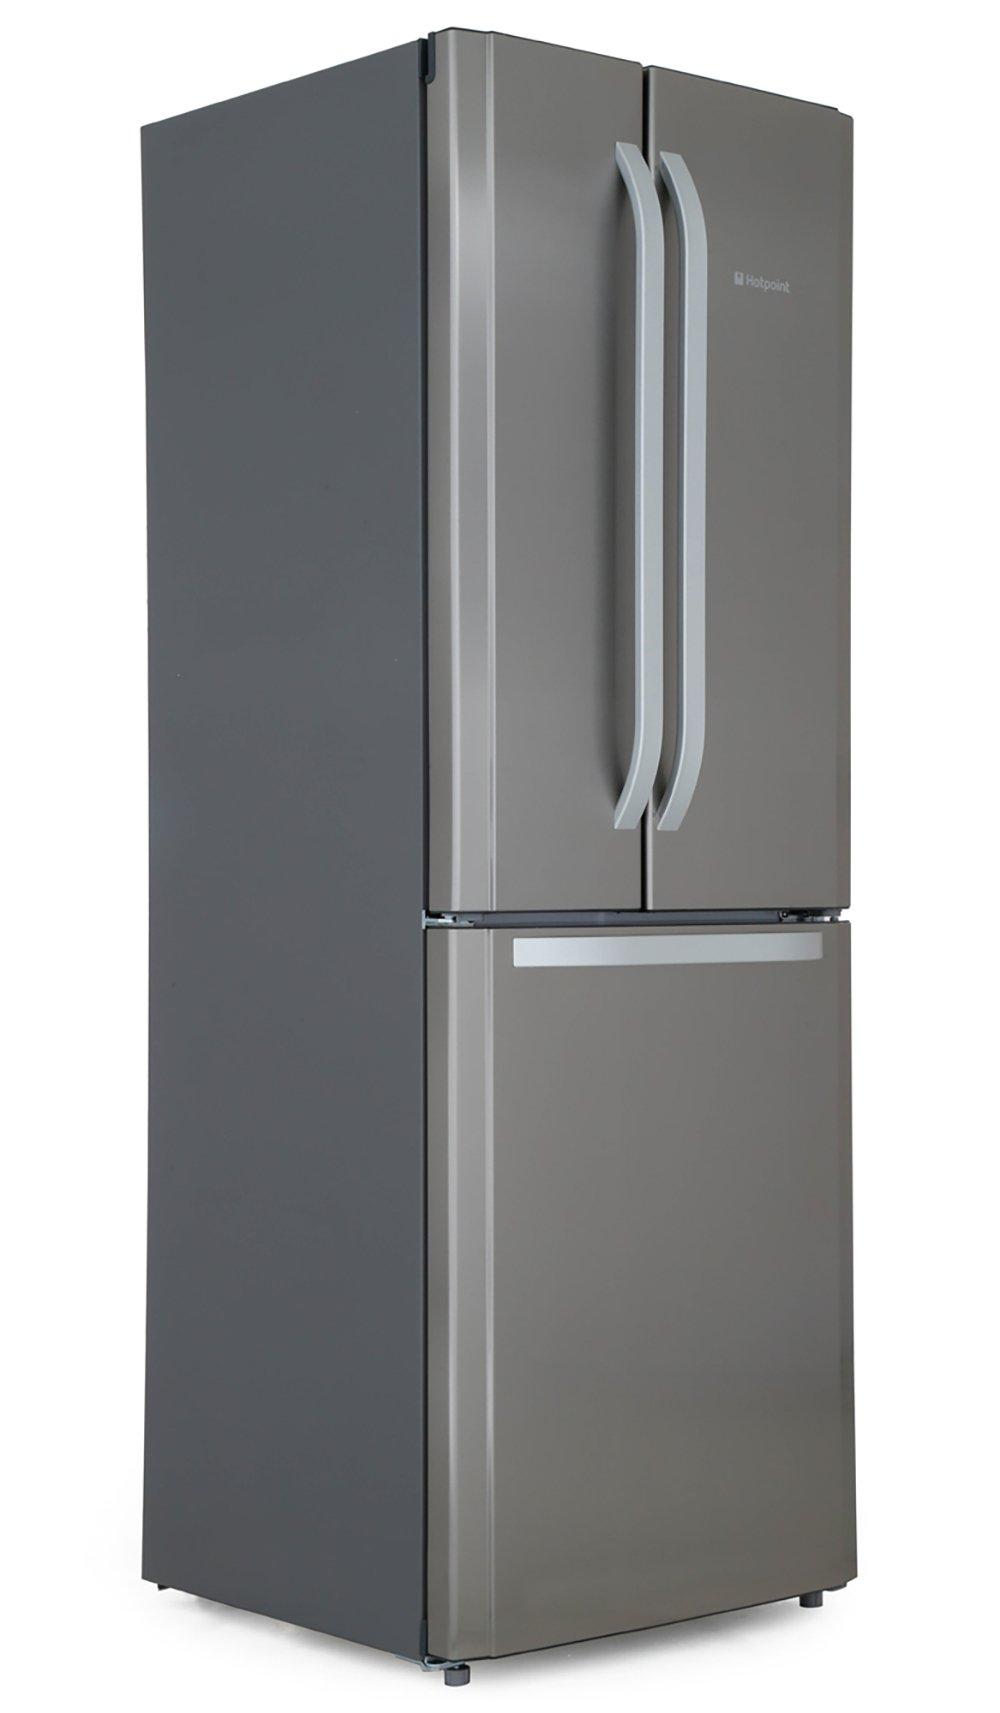 Hotpoint FFU3D1 X Frost Free Fridge Freezer